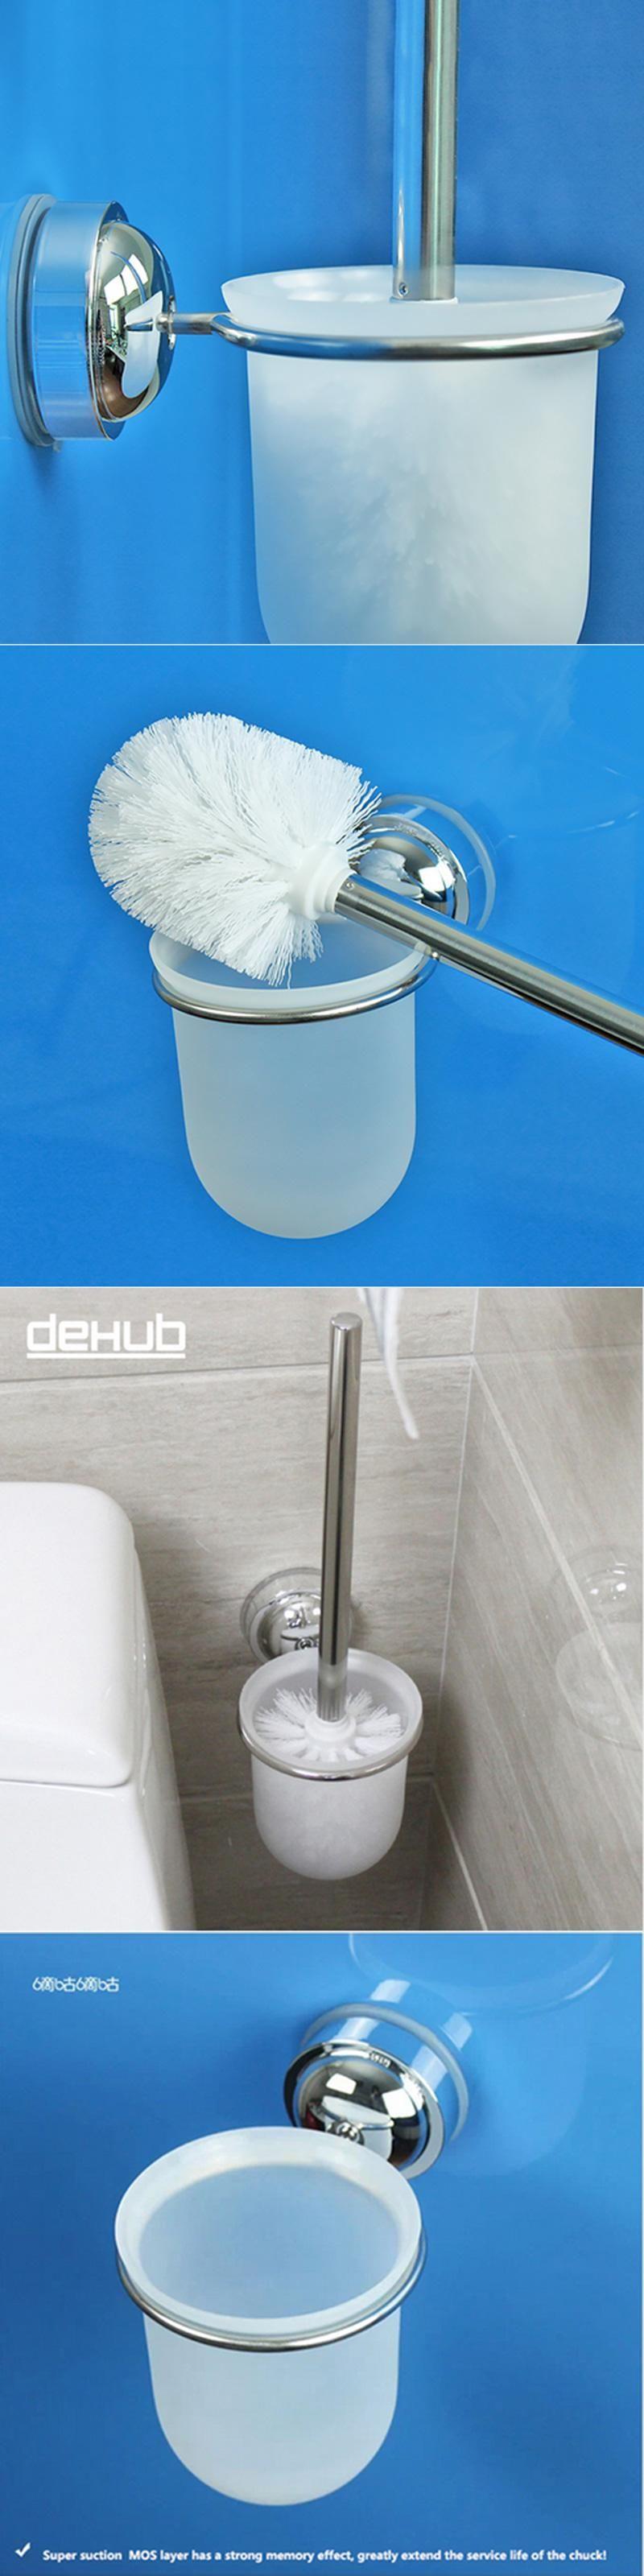 Luxury Suction Mirror Bathroom Illustration - Bathroom - knawi.com